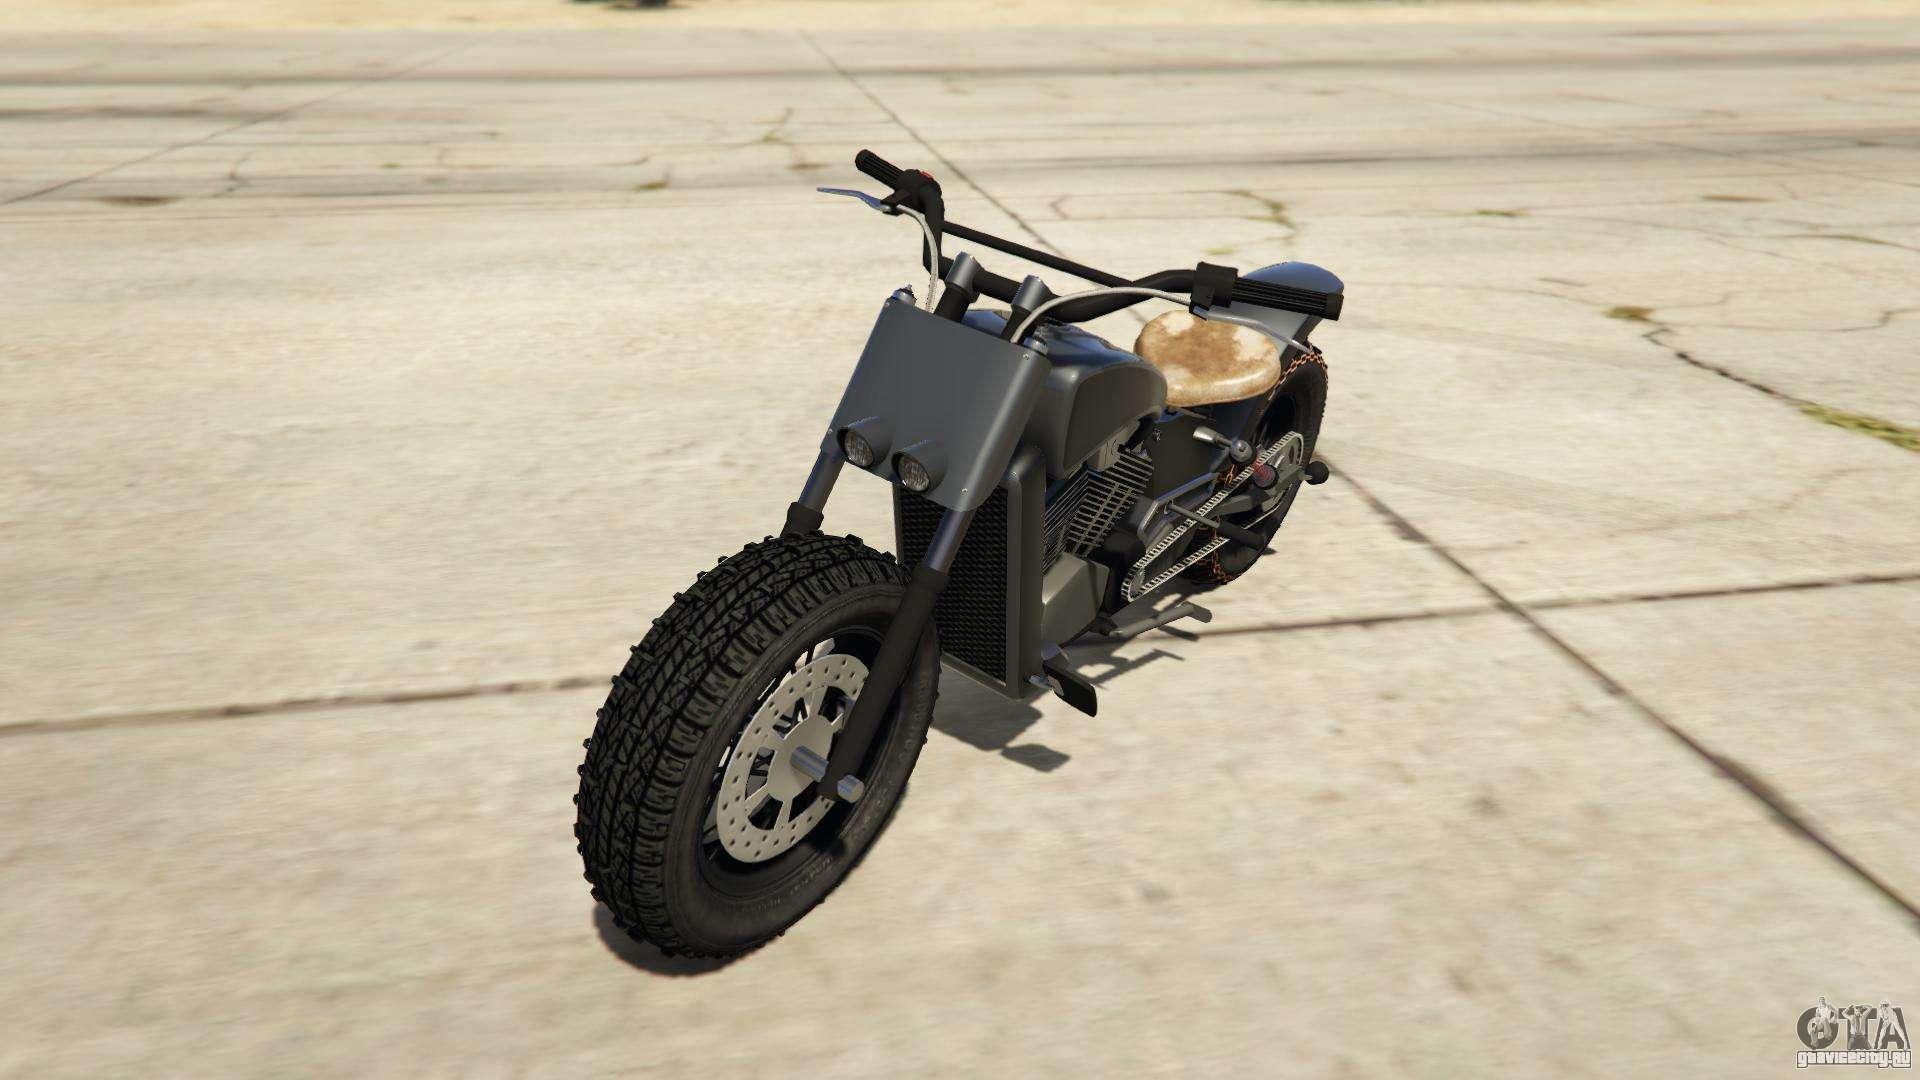 Western Motorcycle Company Gargoyle из GTA Online - вид спереди